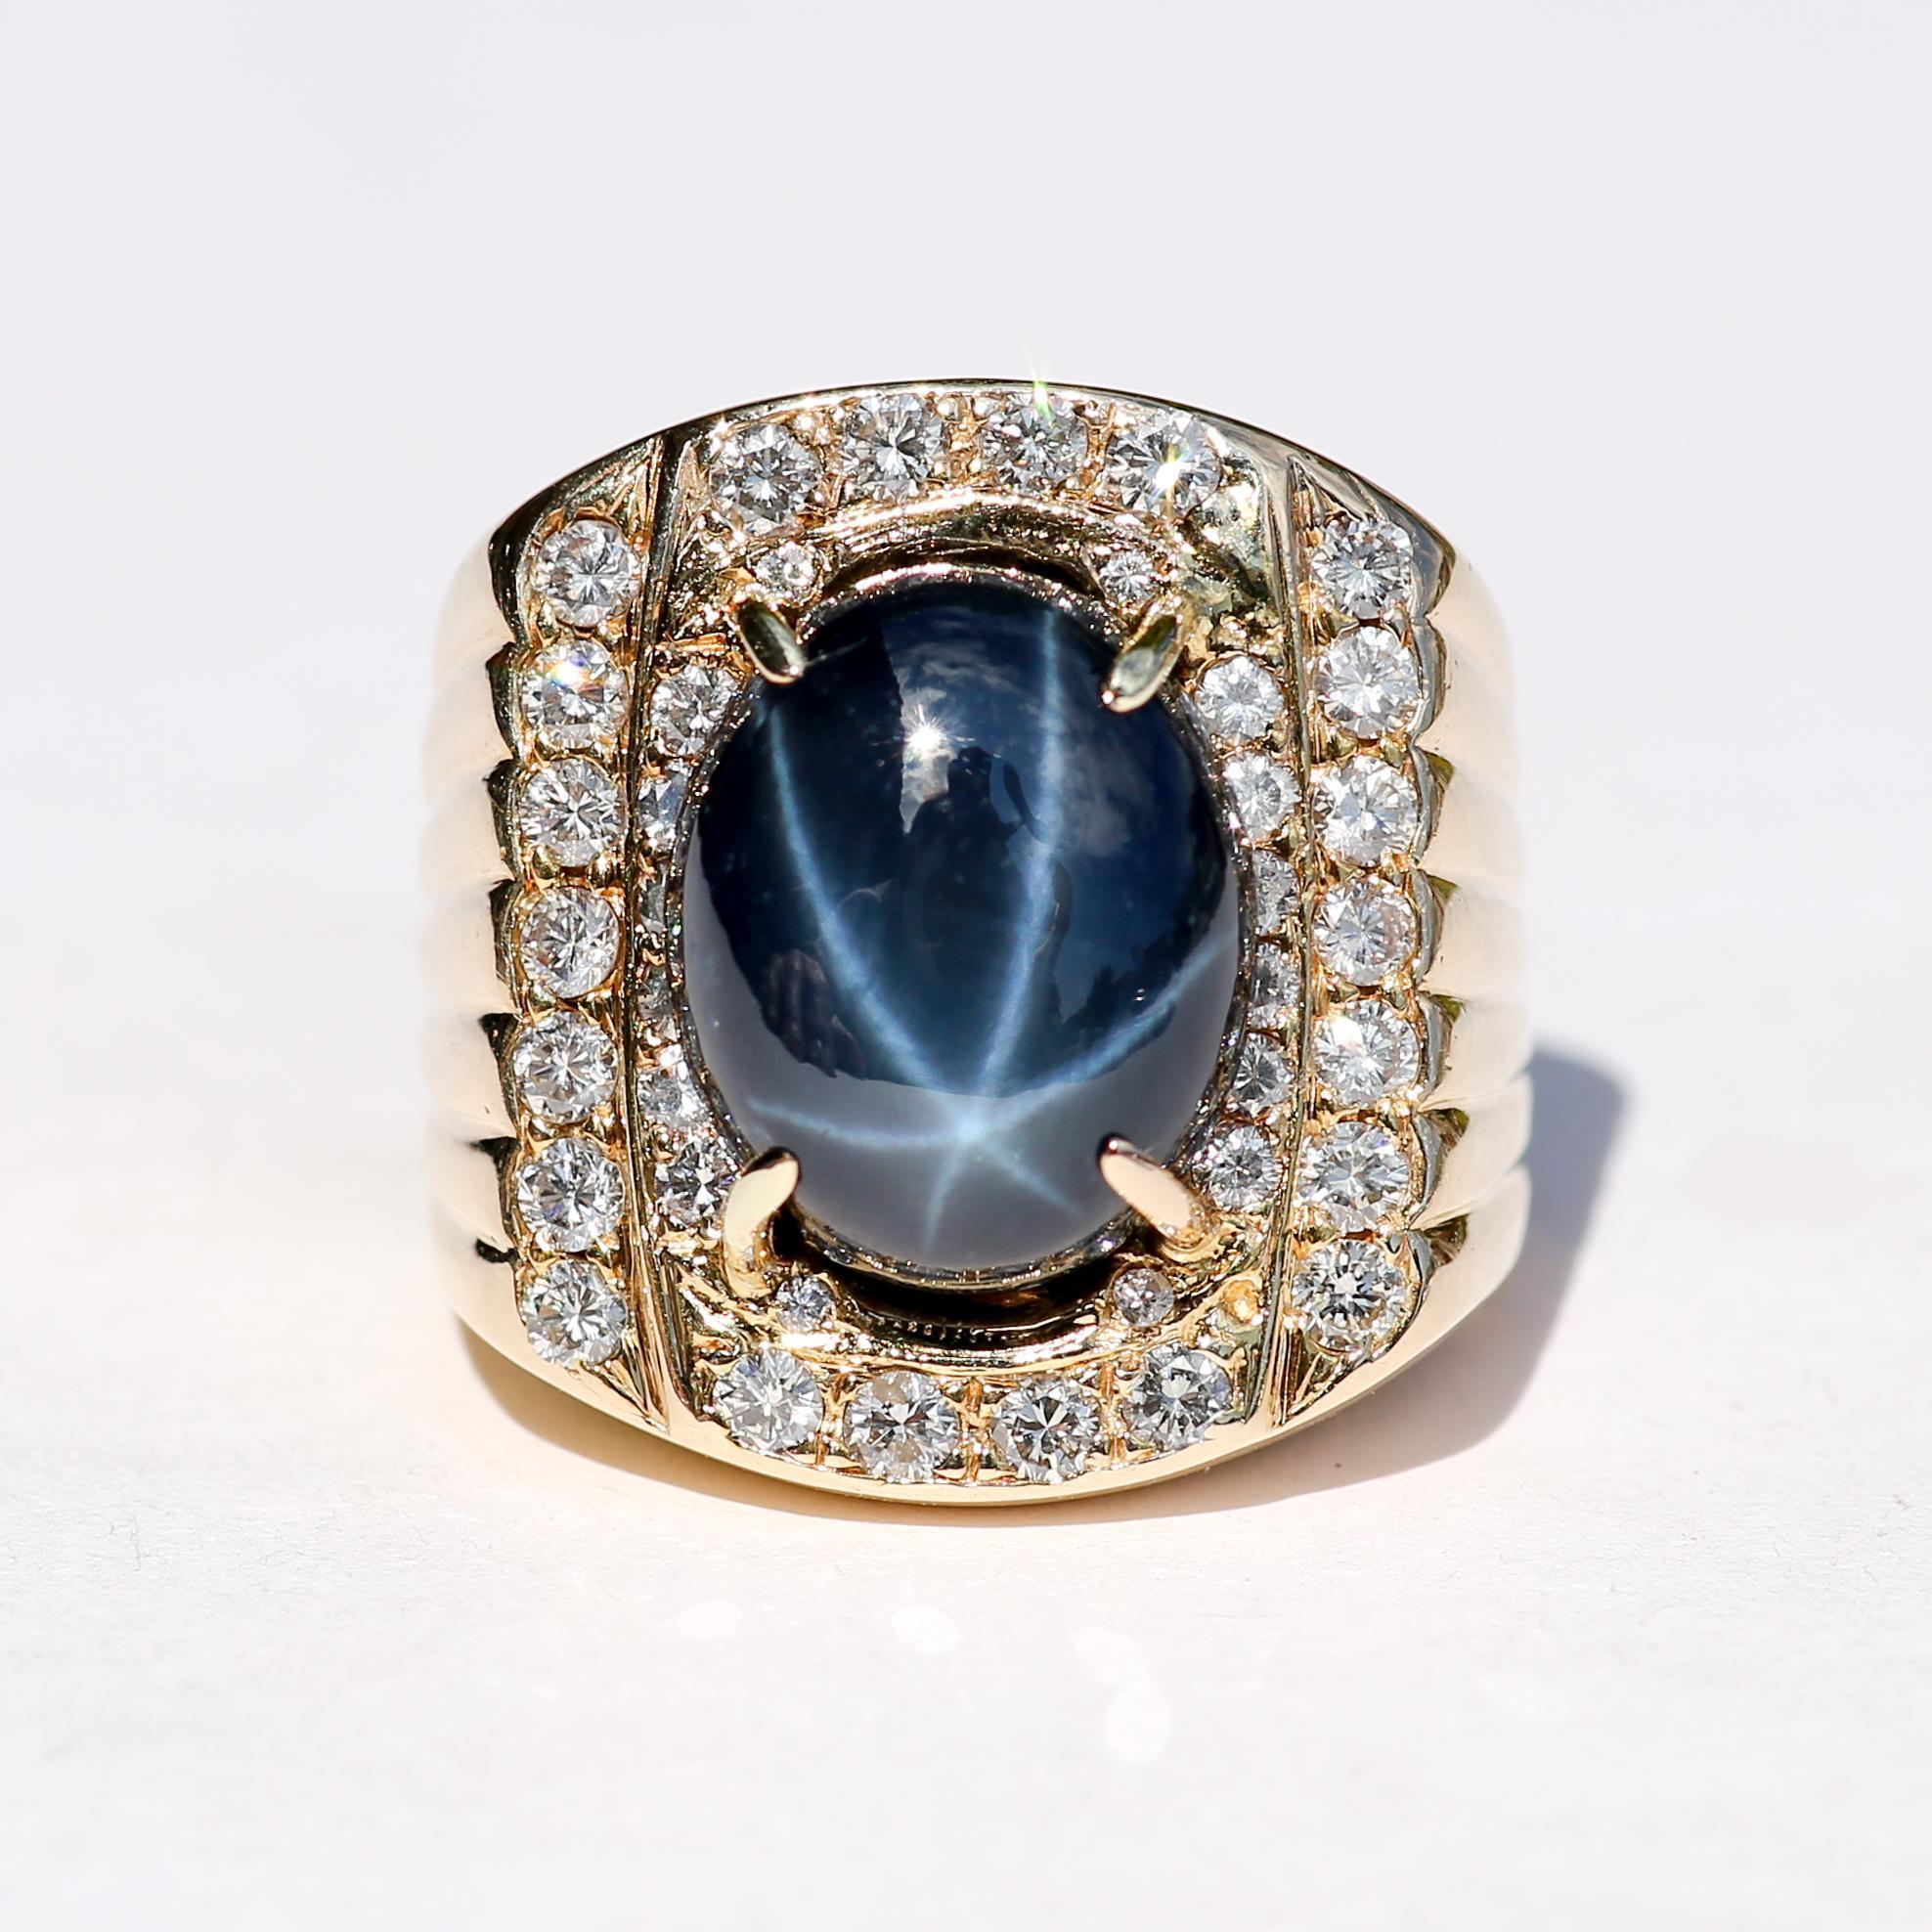 Gent's Vintage Custom 14K 12.56 Carat Sapphire & Diamond Ring